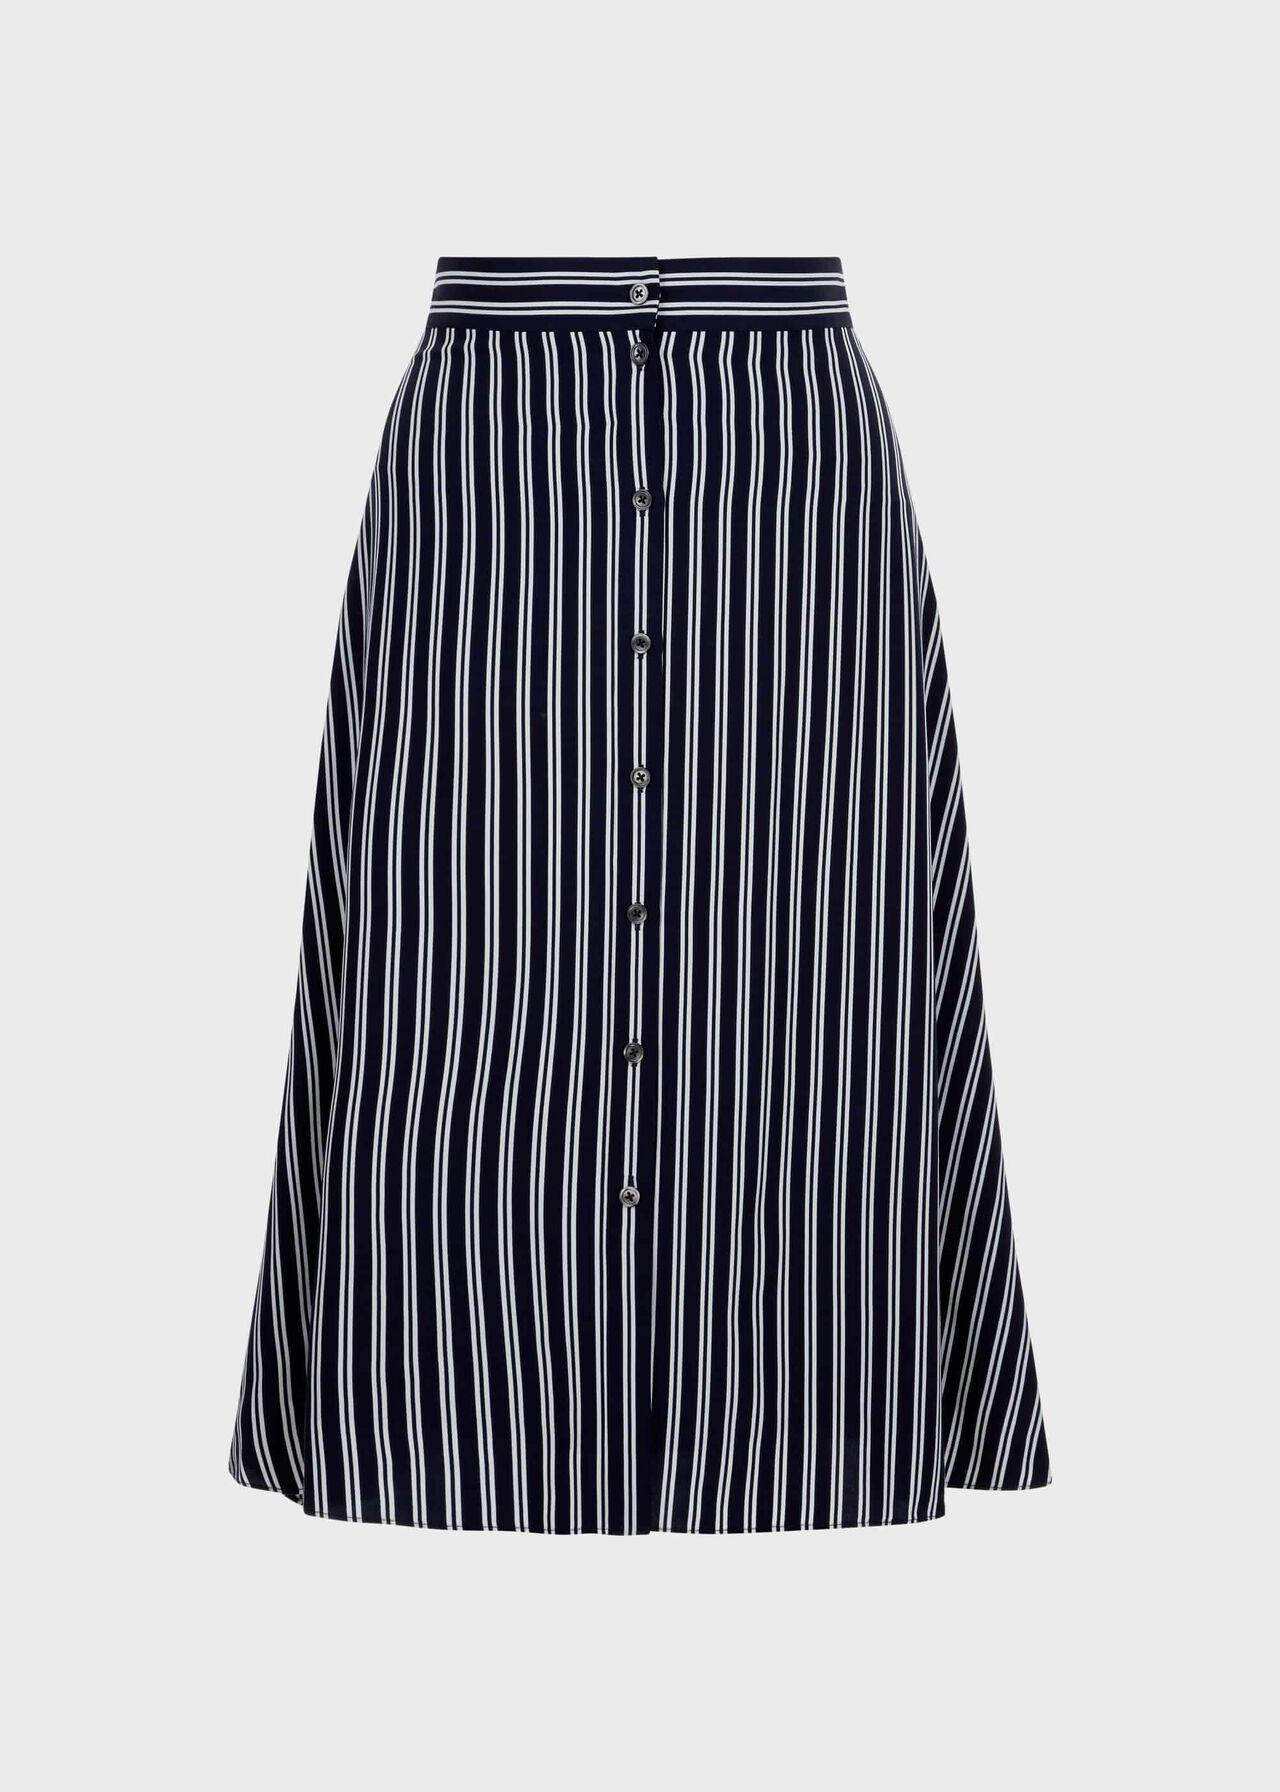 Monroe Stripe A Line Skirt Navy Ivory